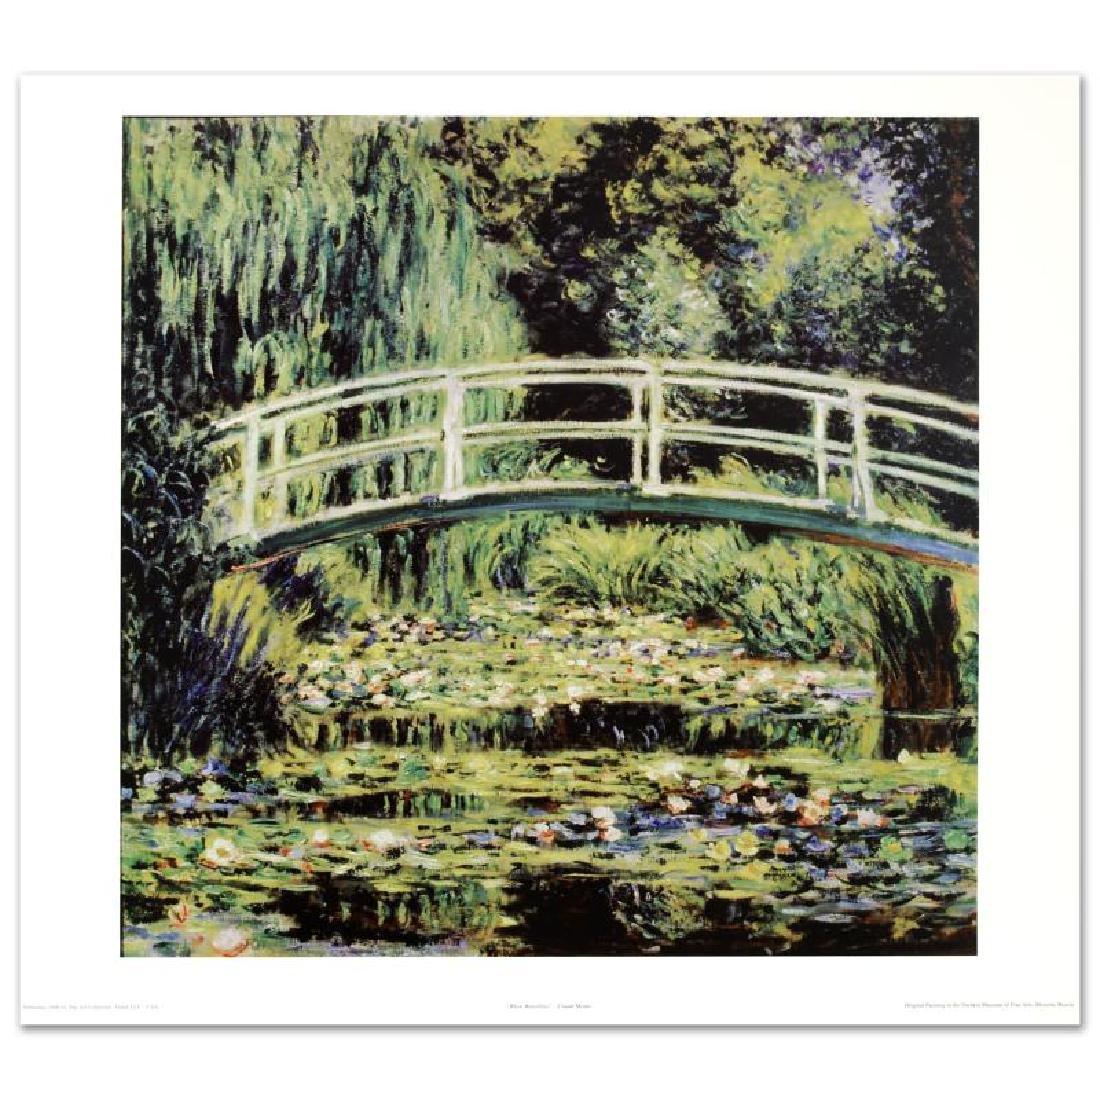 """White Waterlilies"" Fine Art Print by Monet (1840-1926)"